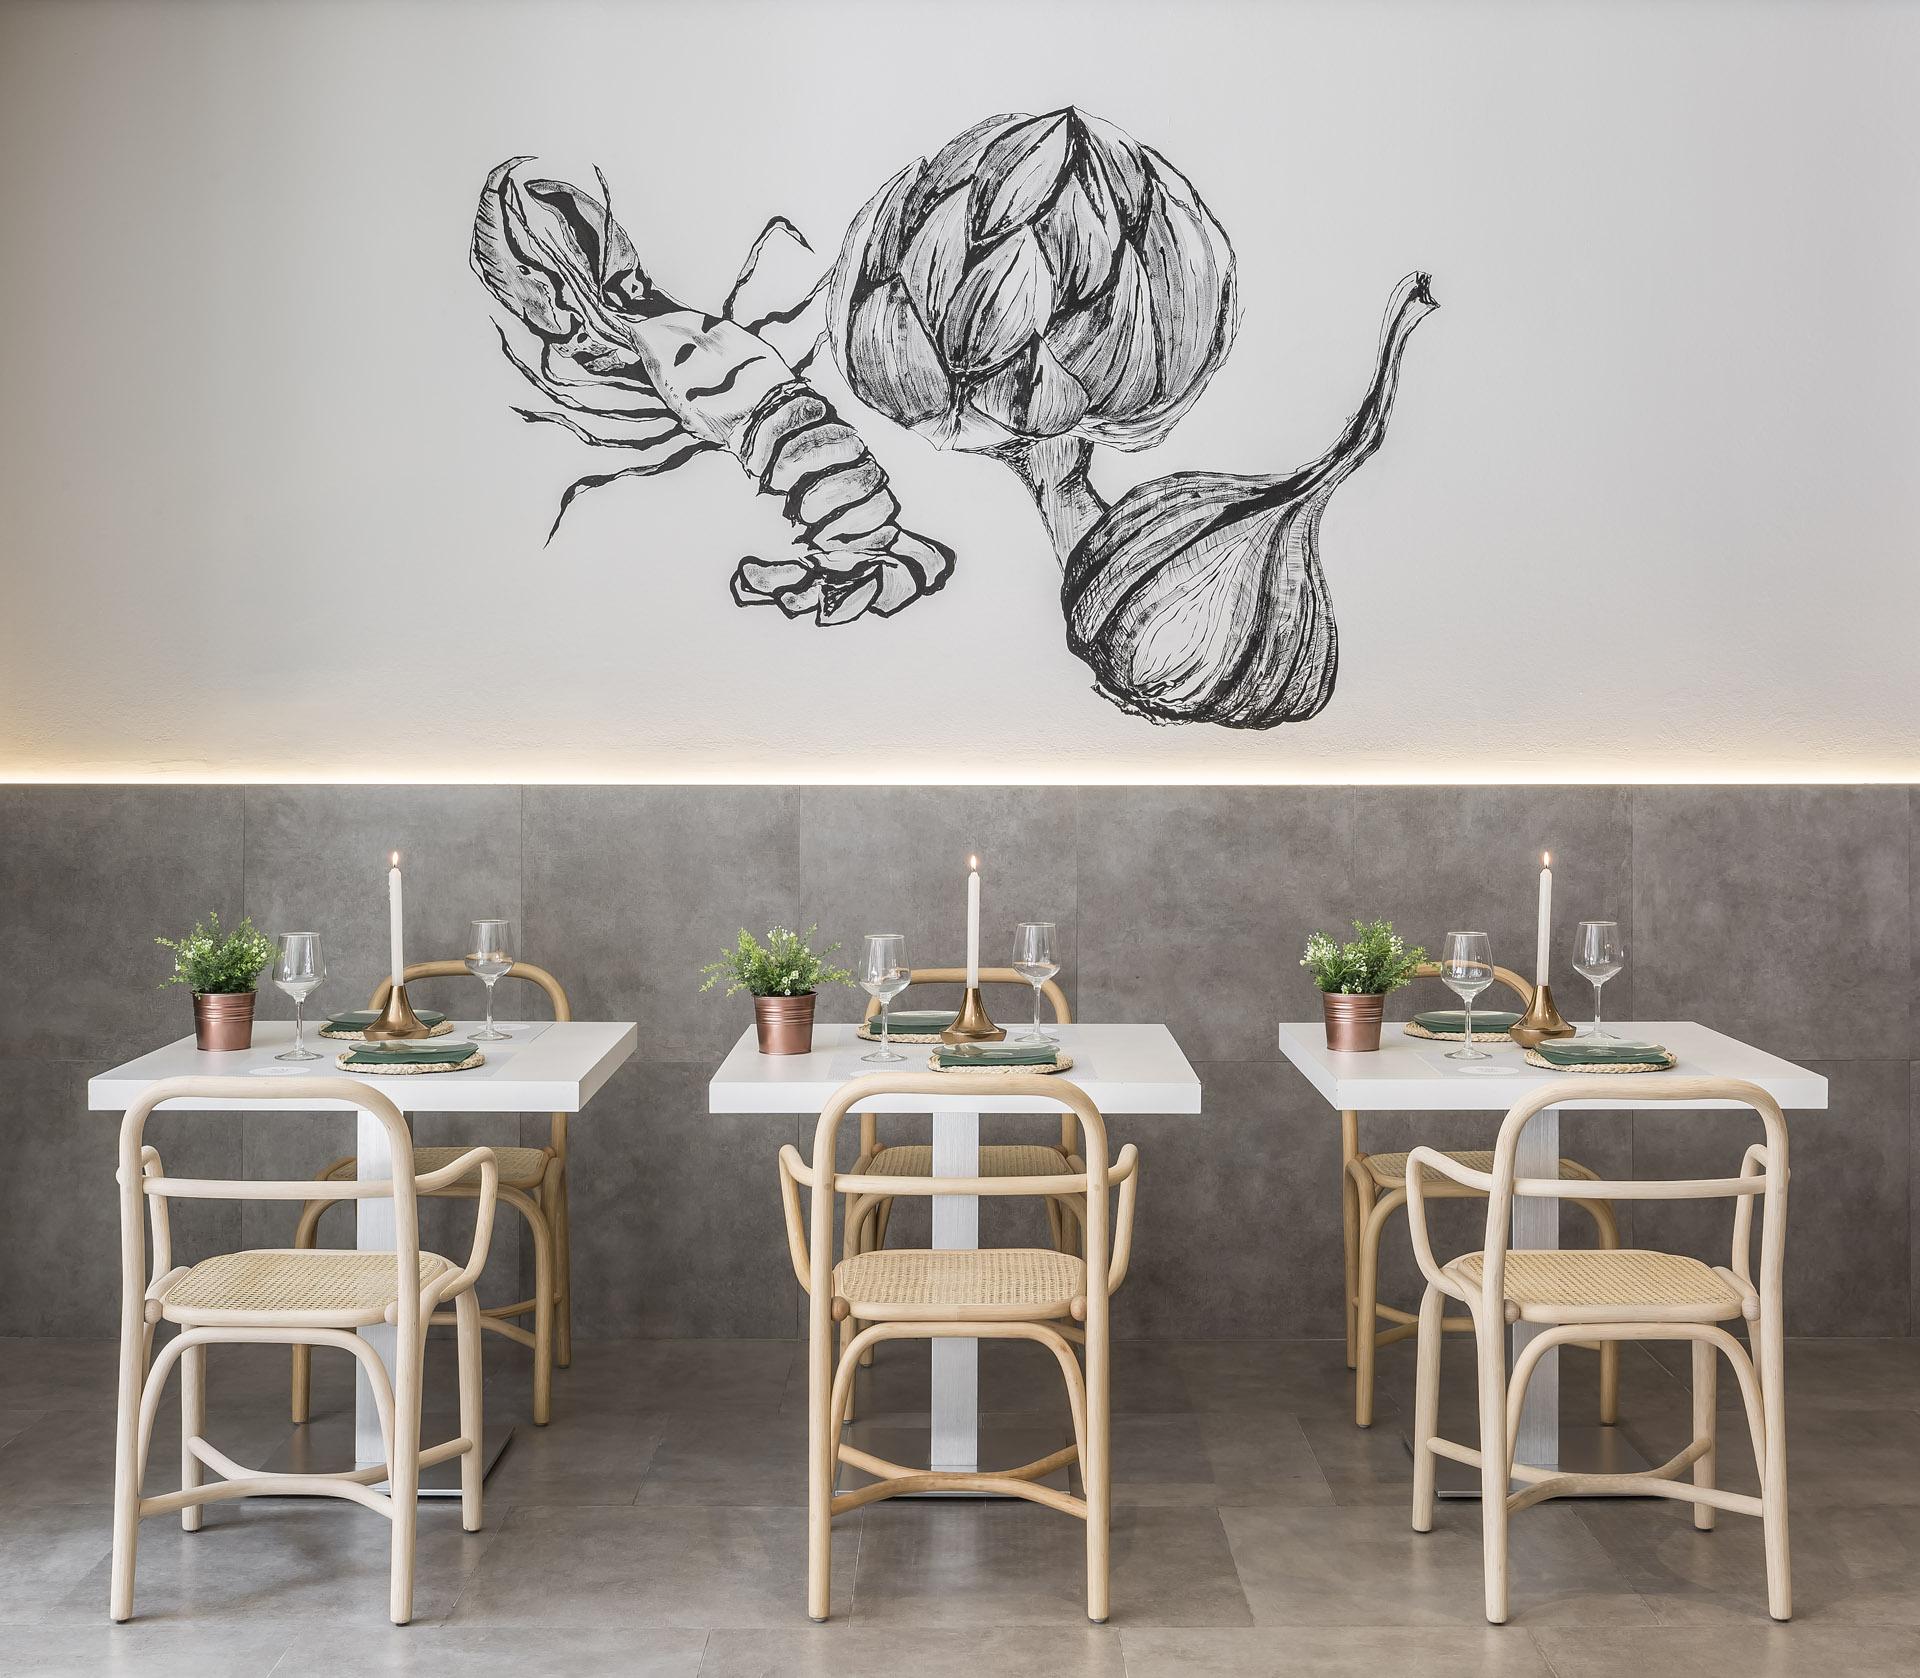 fotografia-arquitectura-valencia-german-cabo-estudihac-restaurante-nac-ontinyent-11